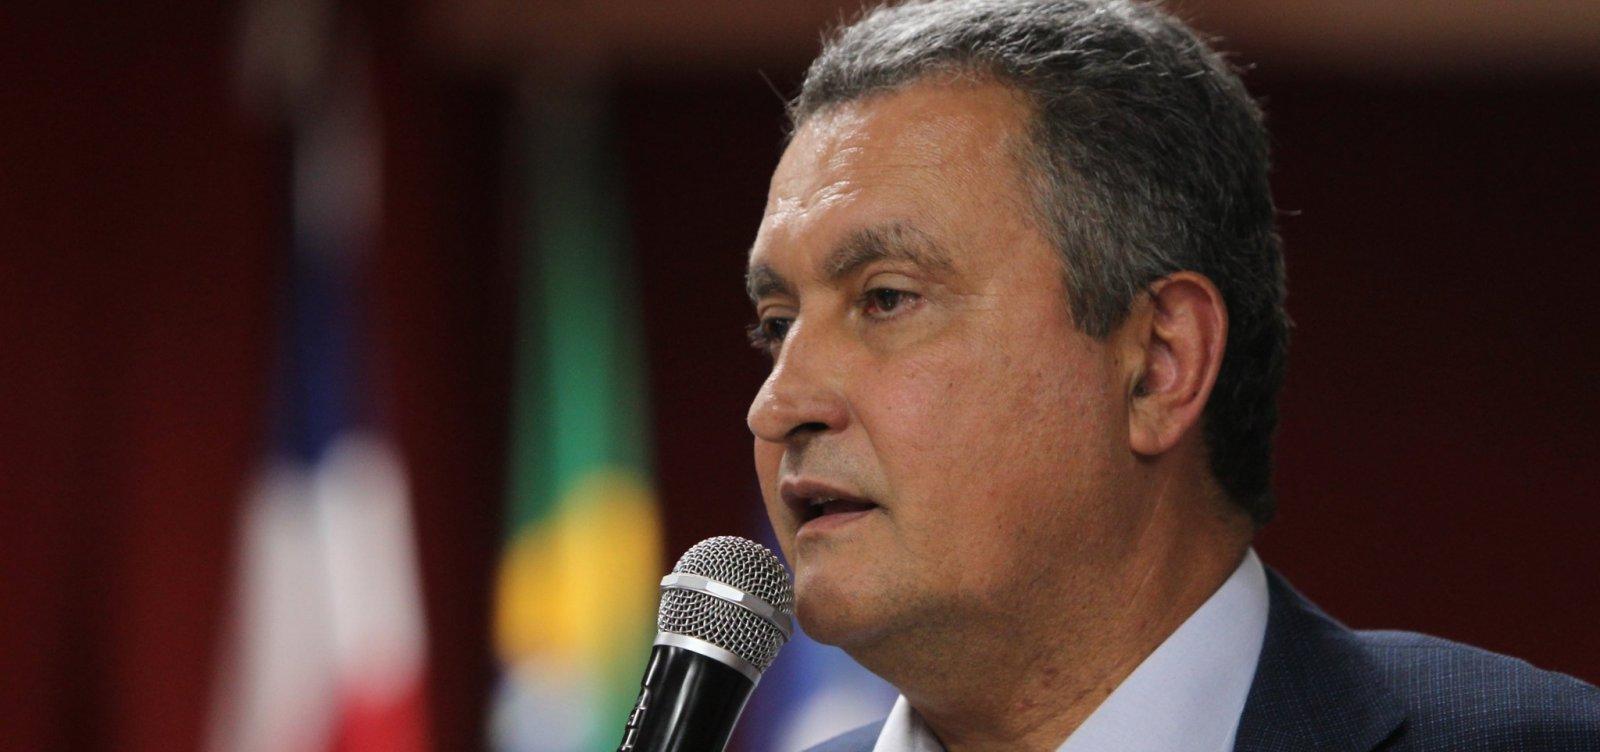 Brasil: ¿Qué hacer? | SurySur